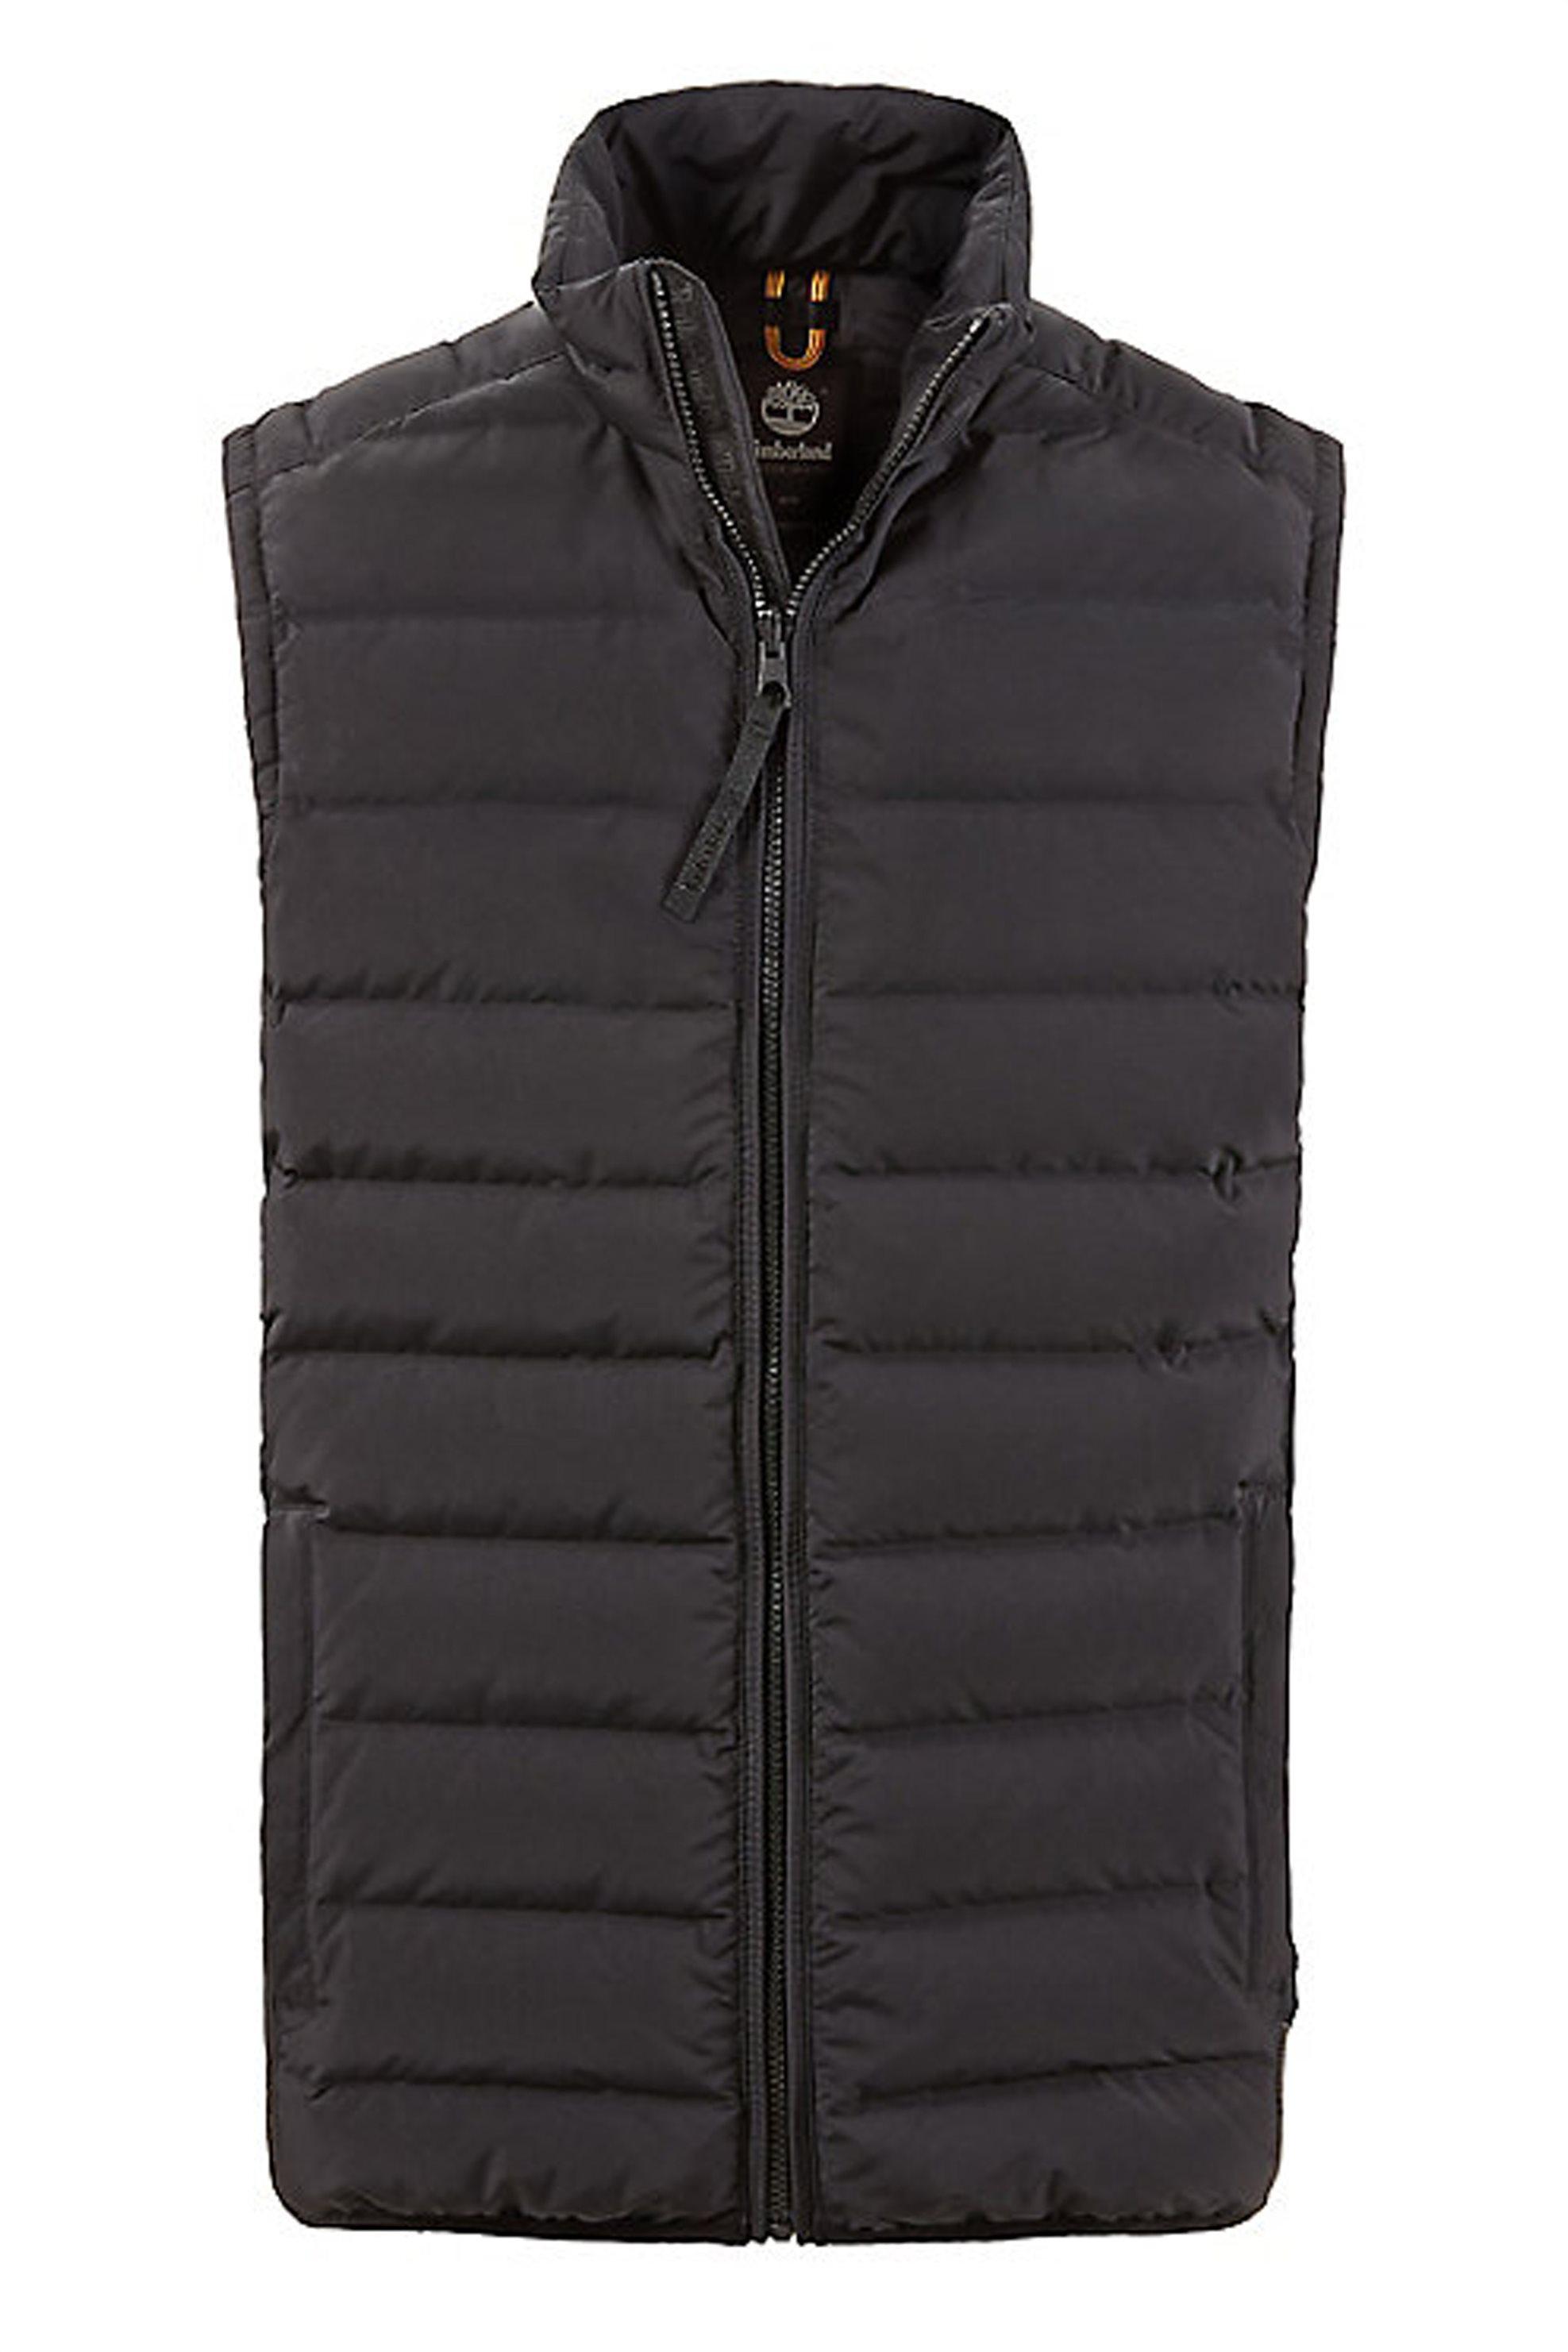 Timberland ανδρικό αμάνικο καπιτονέ μπουφάν Bear Head - TB0A1N210011 - Μαύρο ανδρασ   ρουχα   παλτό   μπουφάν   αμάνικα